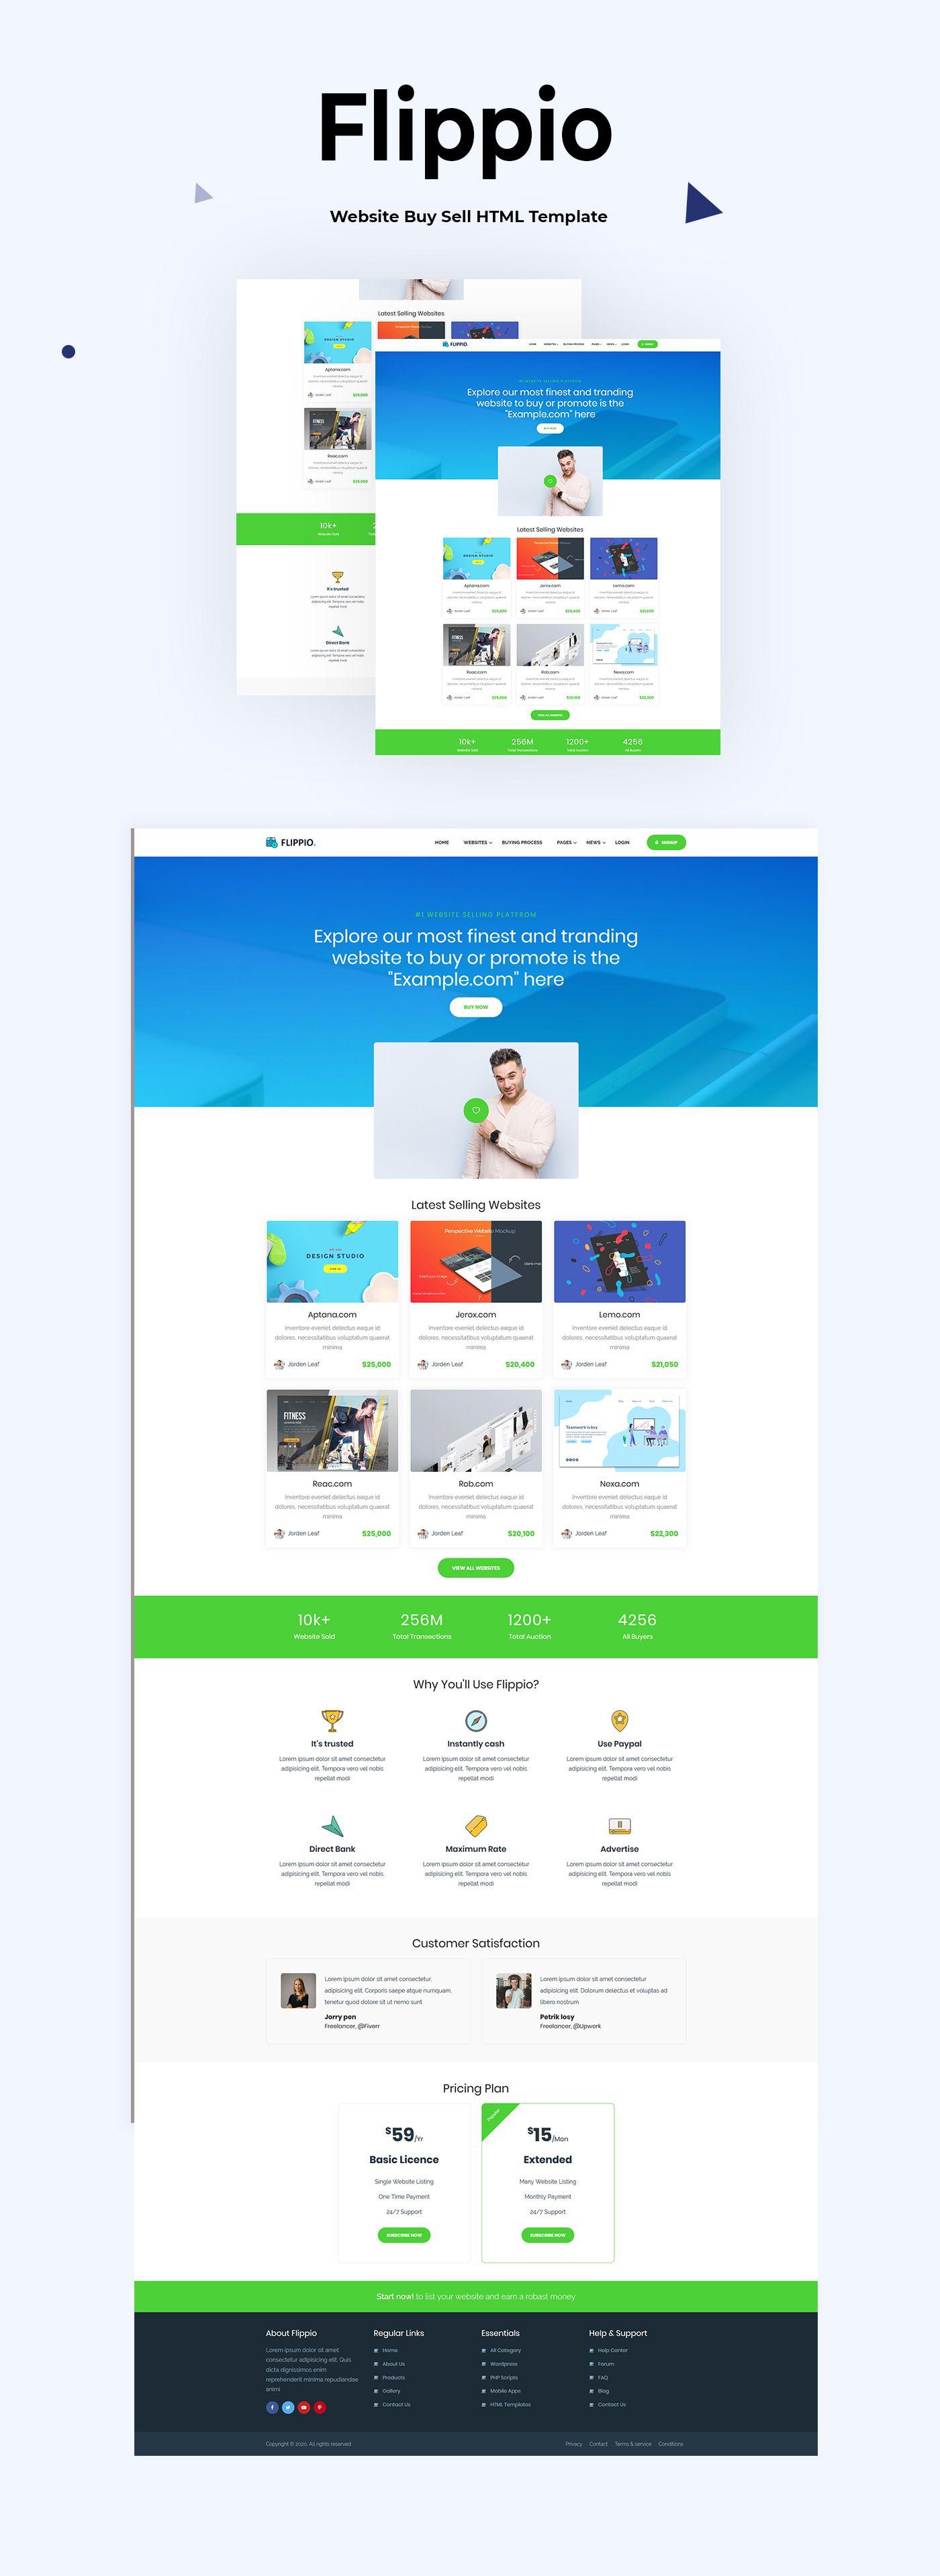 Flippio Website Buy Sell Html Template 29 Usd Thesoftking In 2020 Html Templates Templates Buy And Sell